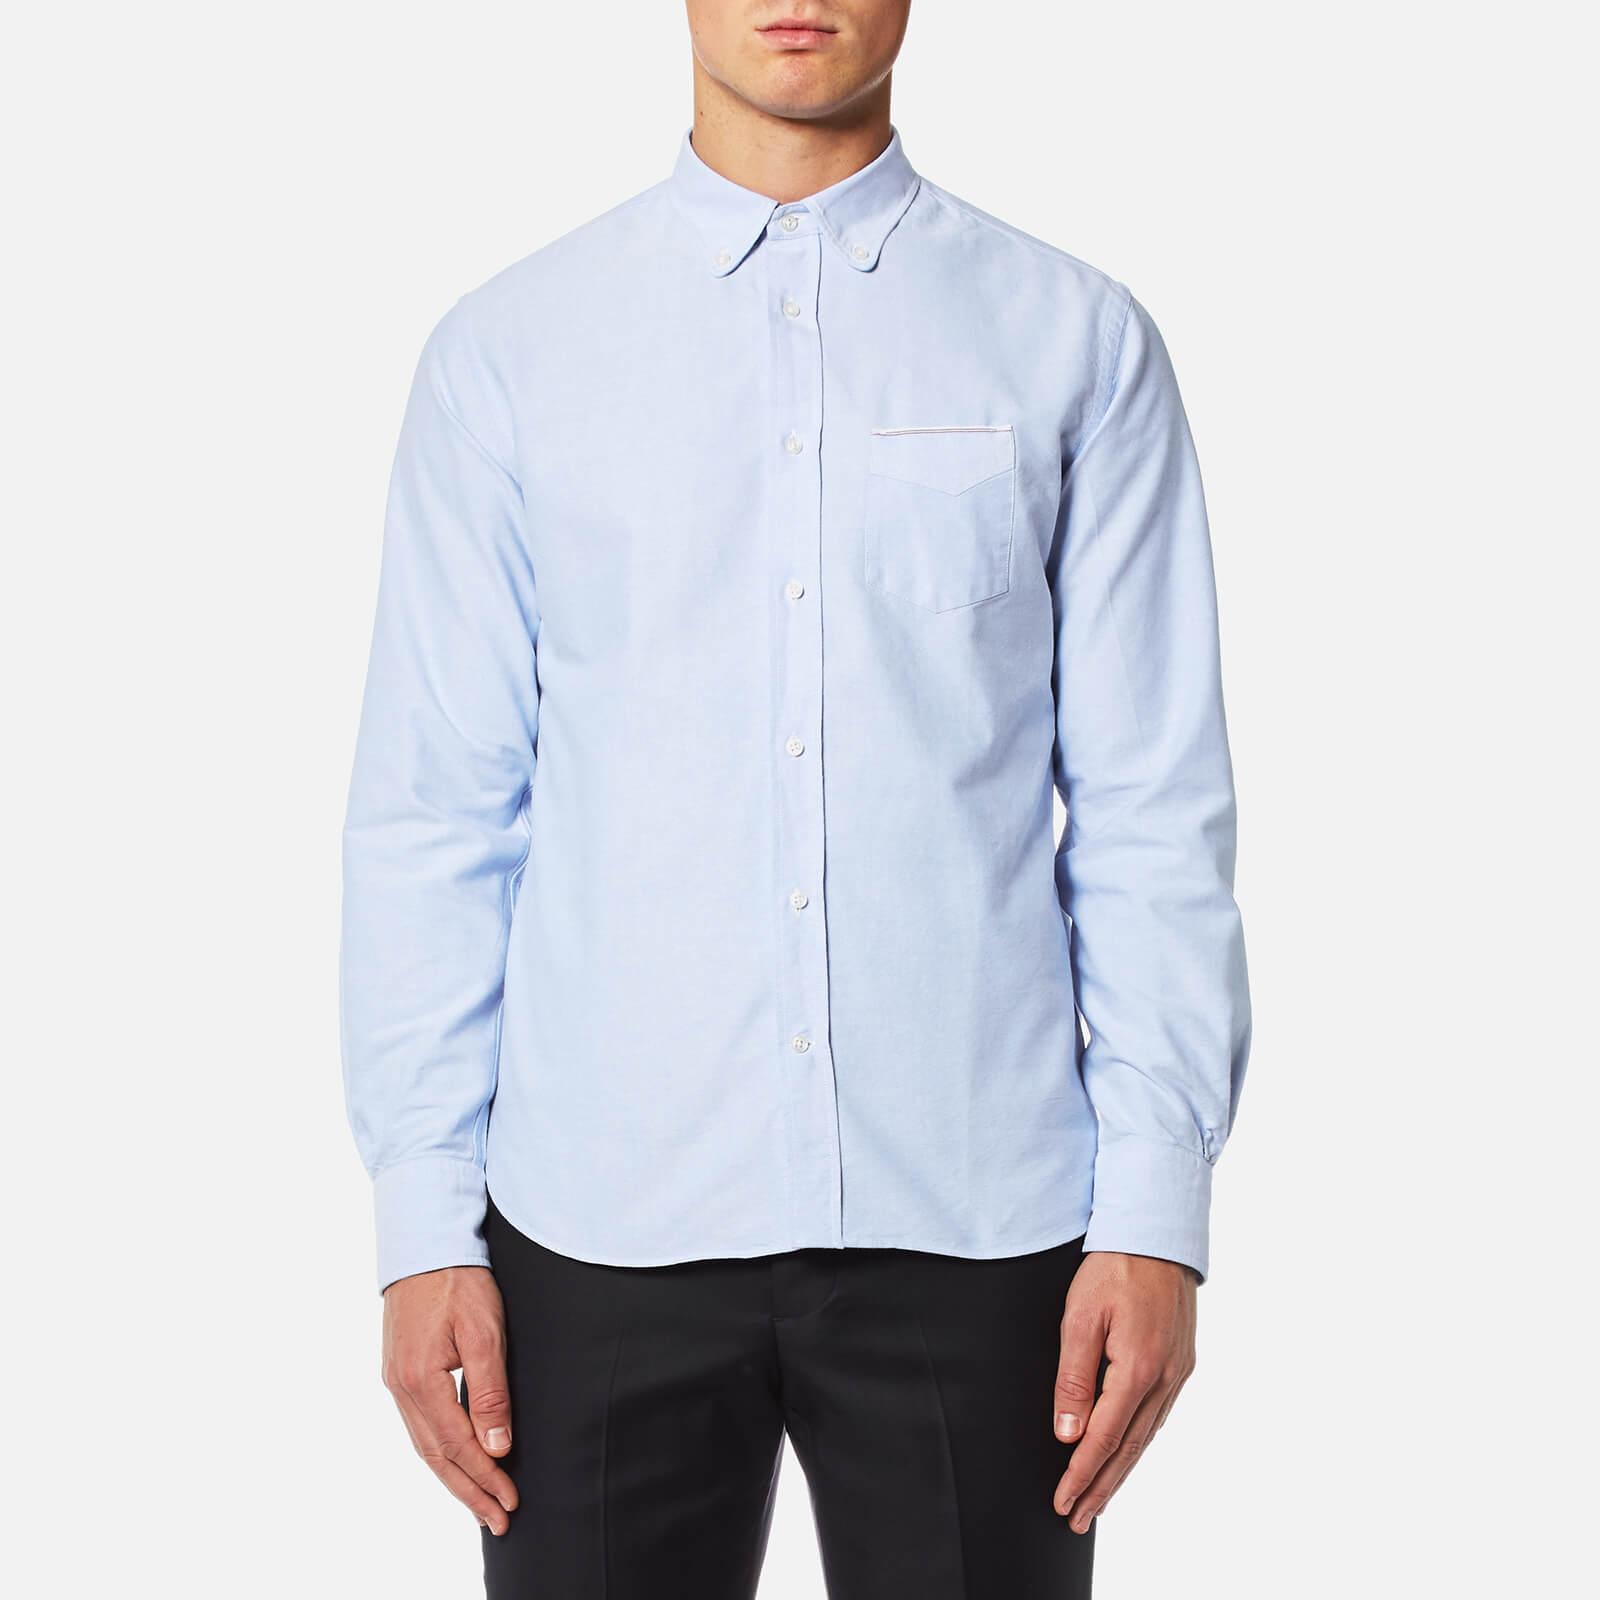 b234150728e2c Officine Générale Men s Button Down Oxford Shirt - Sky - Free UK Delivery  over £50